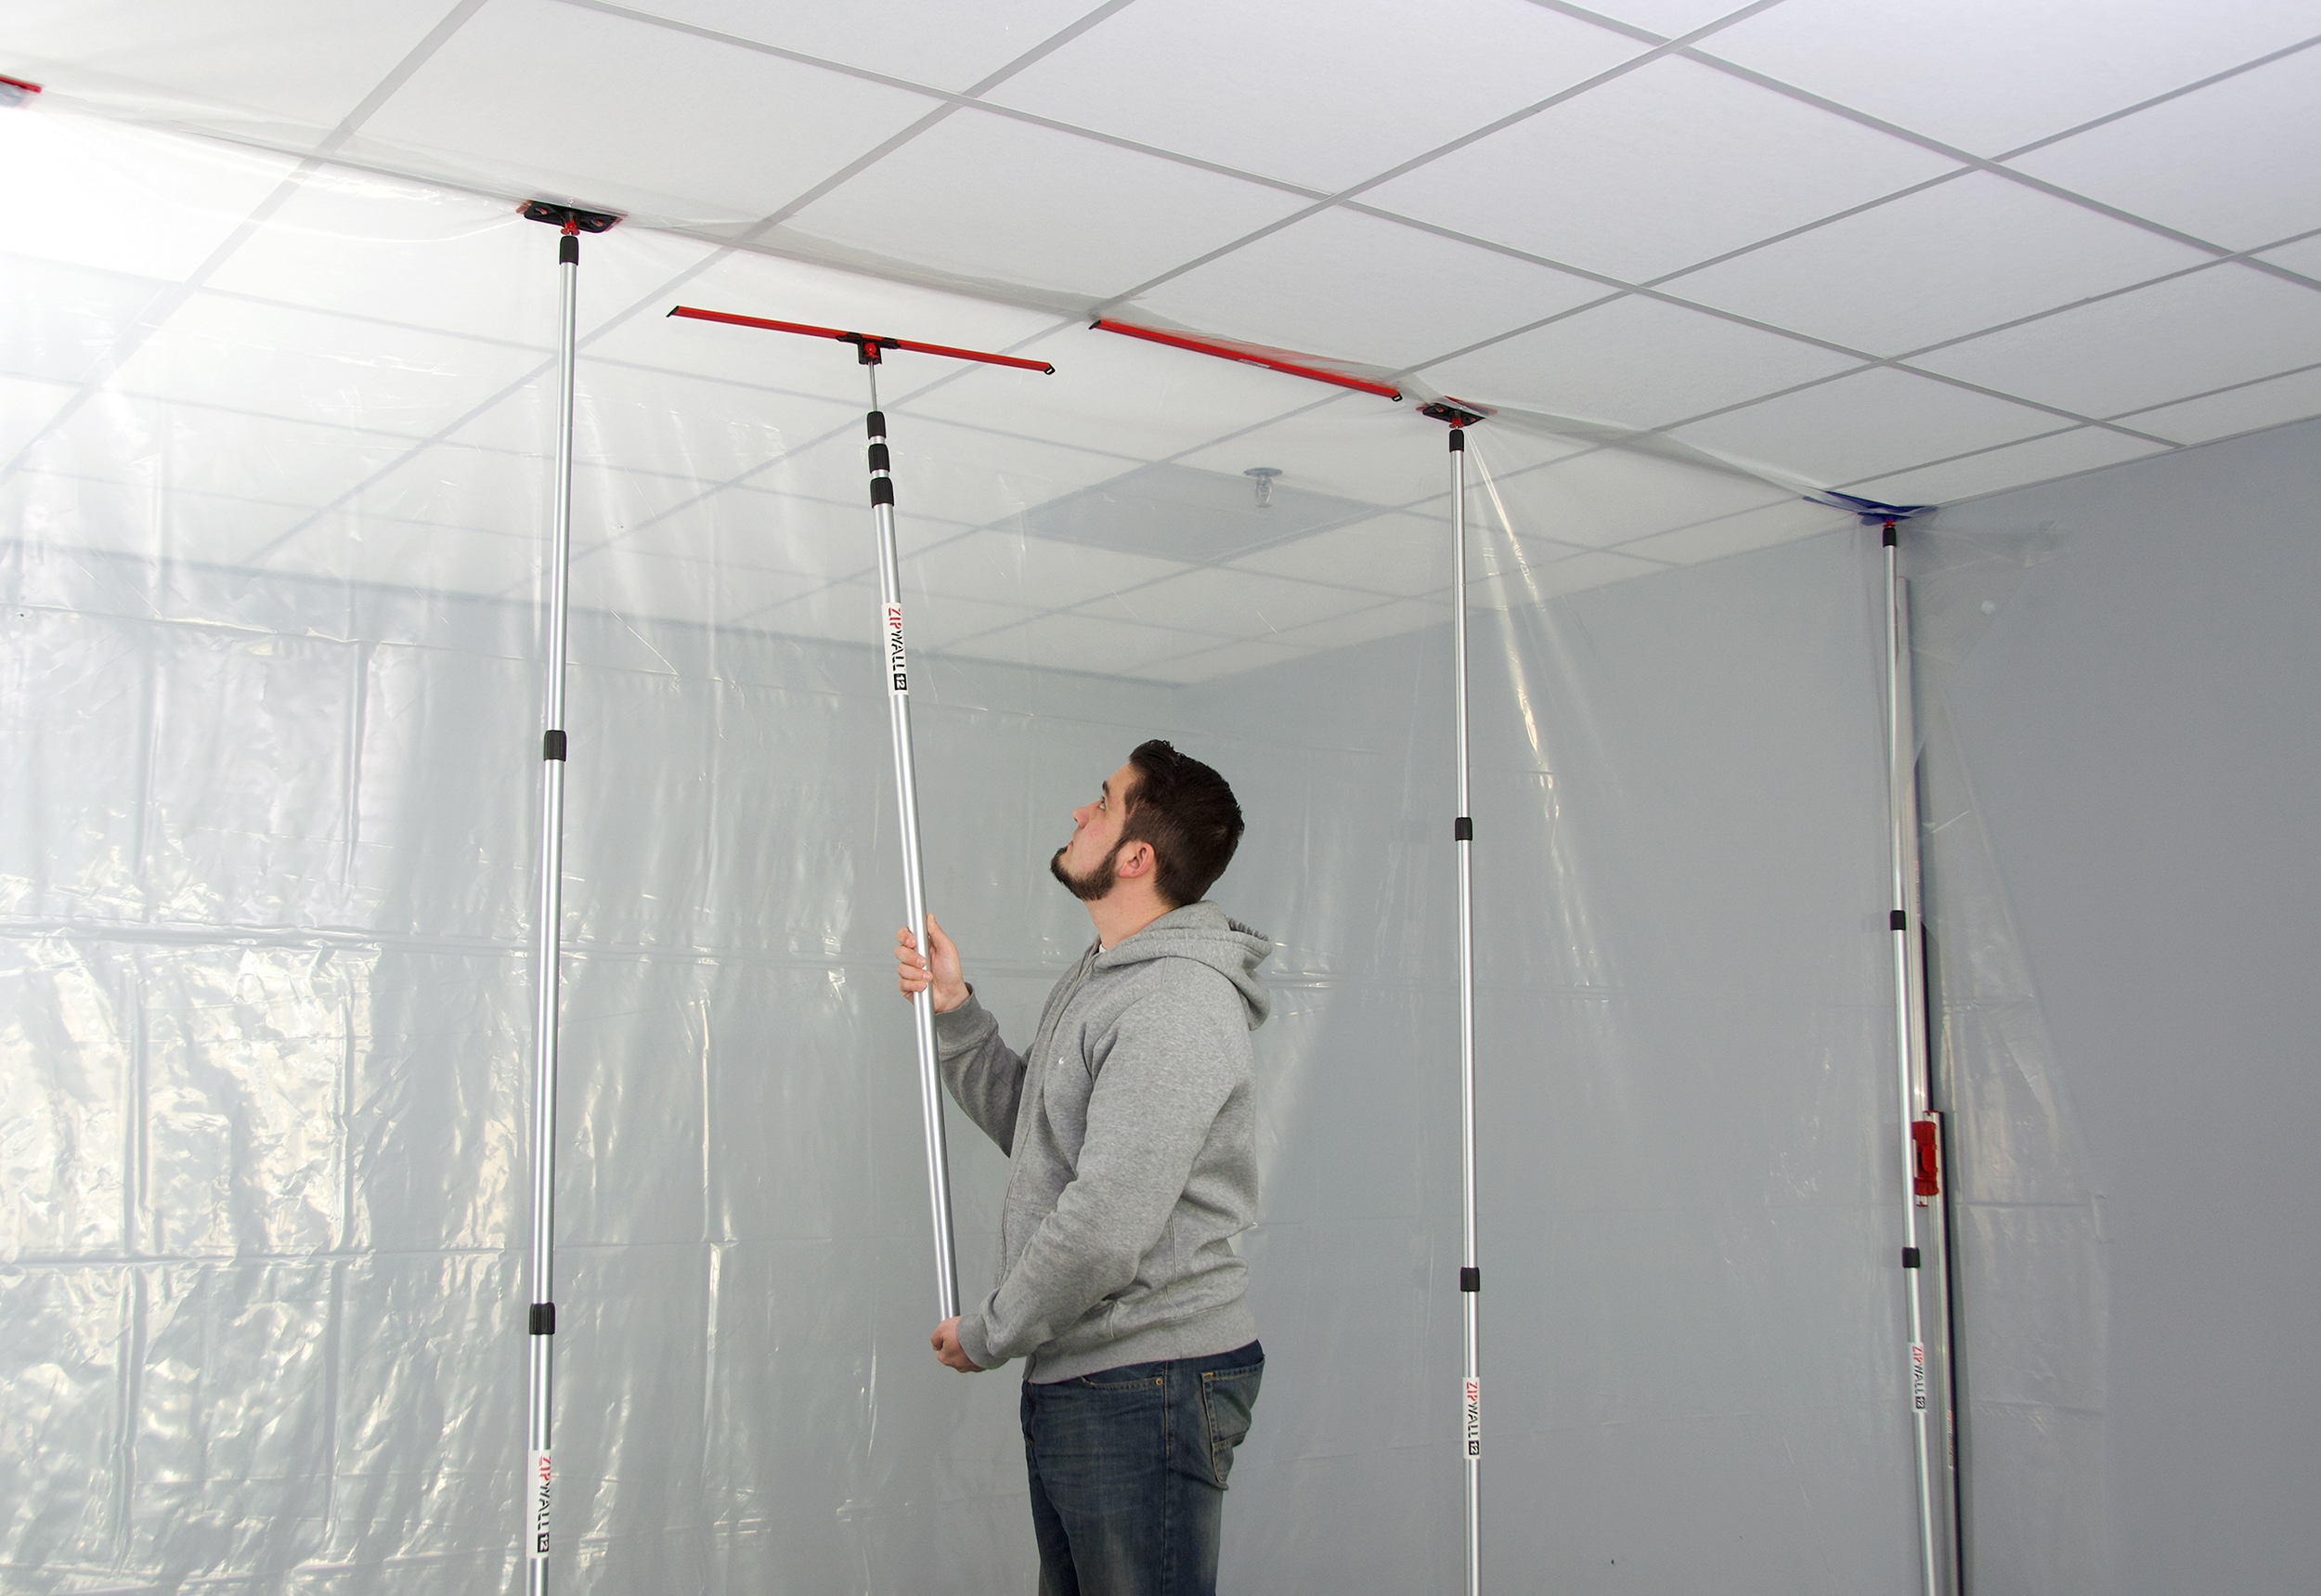 MagStrip Dust Barrier Fastener Joins ZipWall Dust Barrier